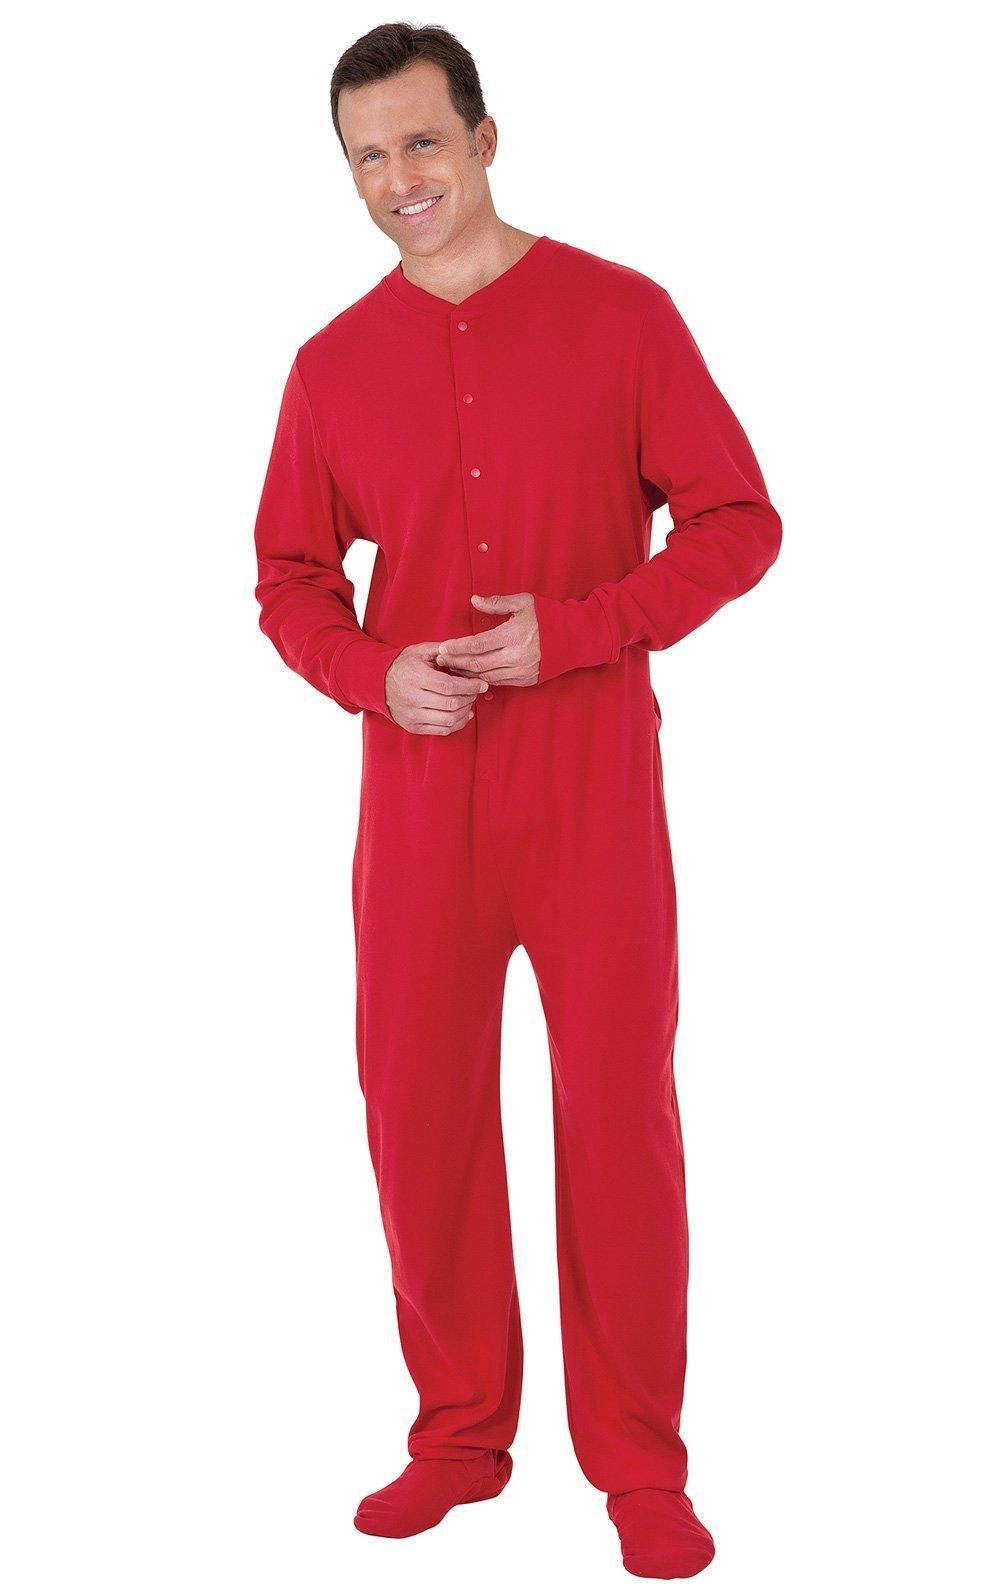 PajamaGram Men's Cotton Dropseat Footie Pajamas, Red, MED